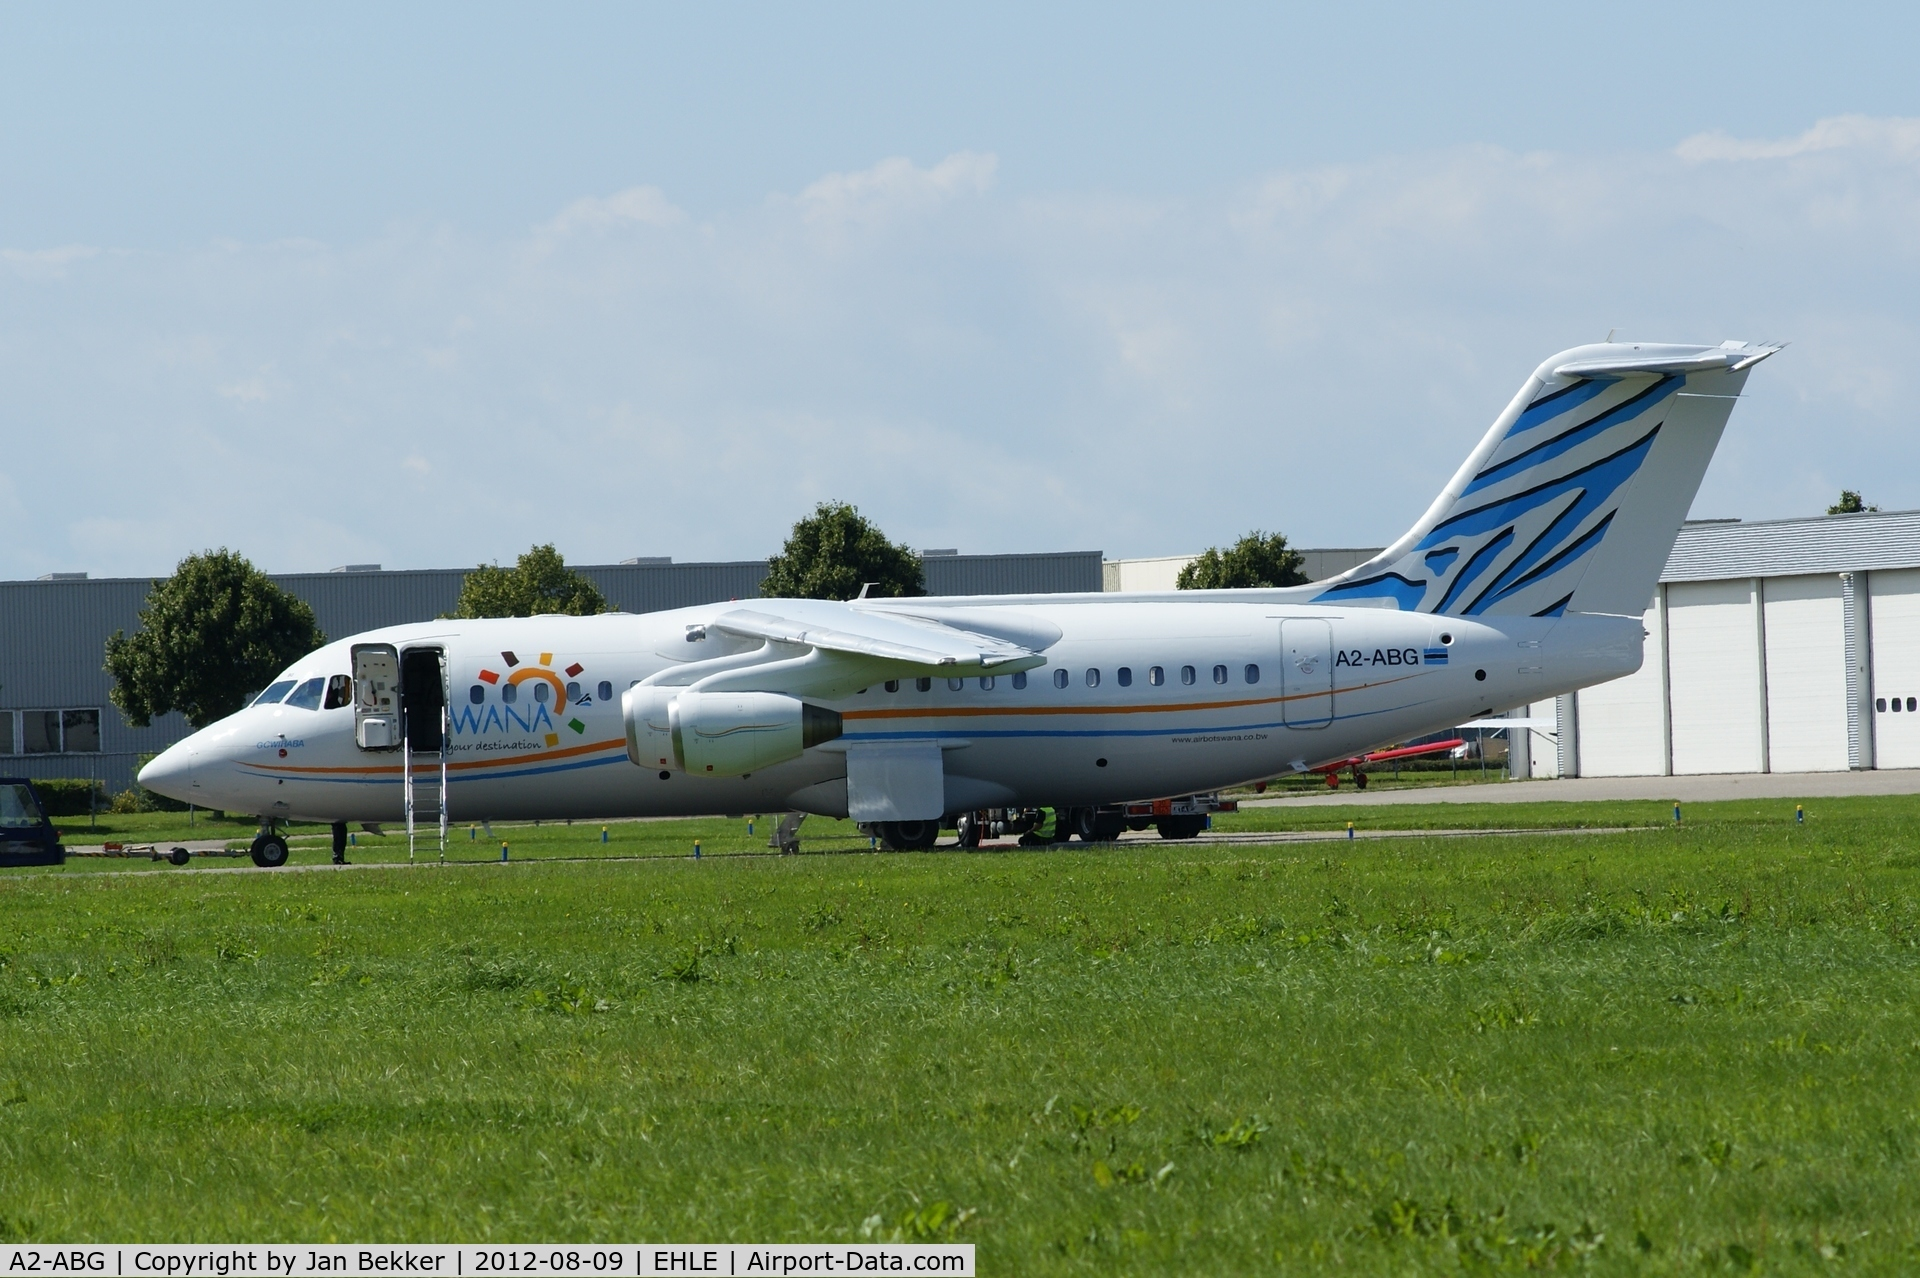 A2-ABG, 1997 British Aerospace Avro 146-RJ85 C/N E.2303, Former Lufthansa D-AVRP. Just got its new livey of Air Botswana by QAPS.